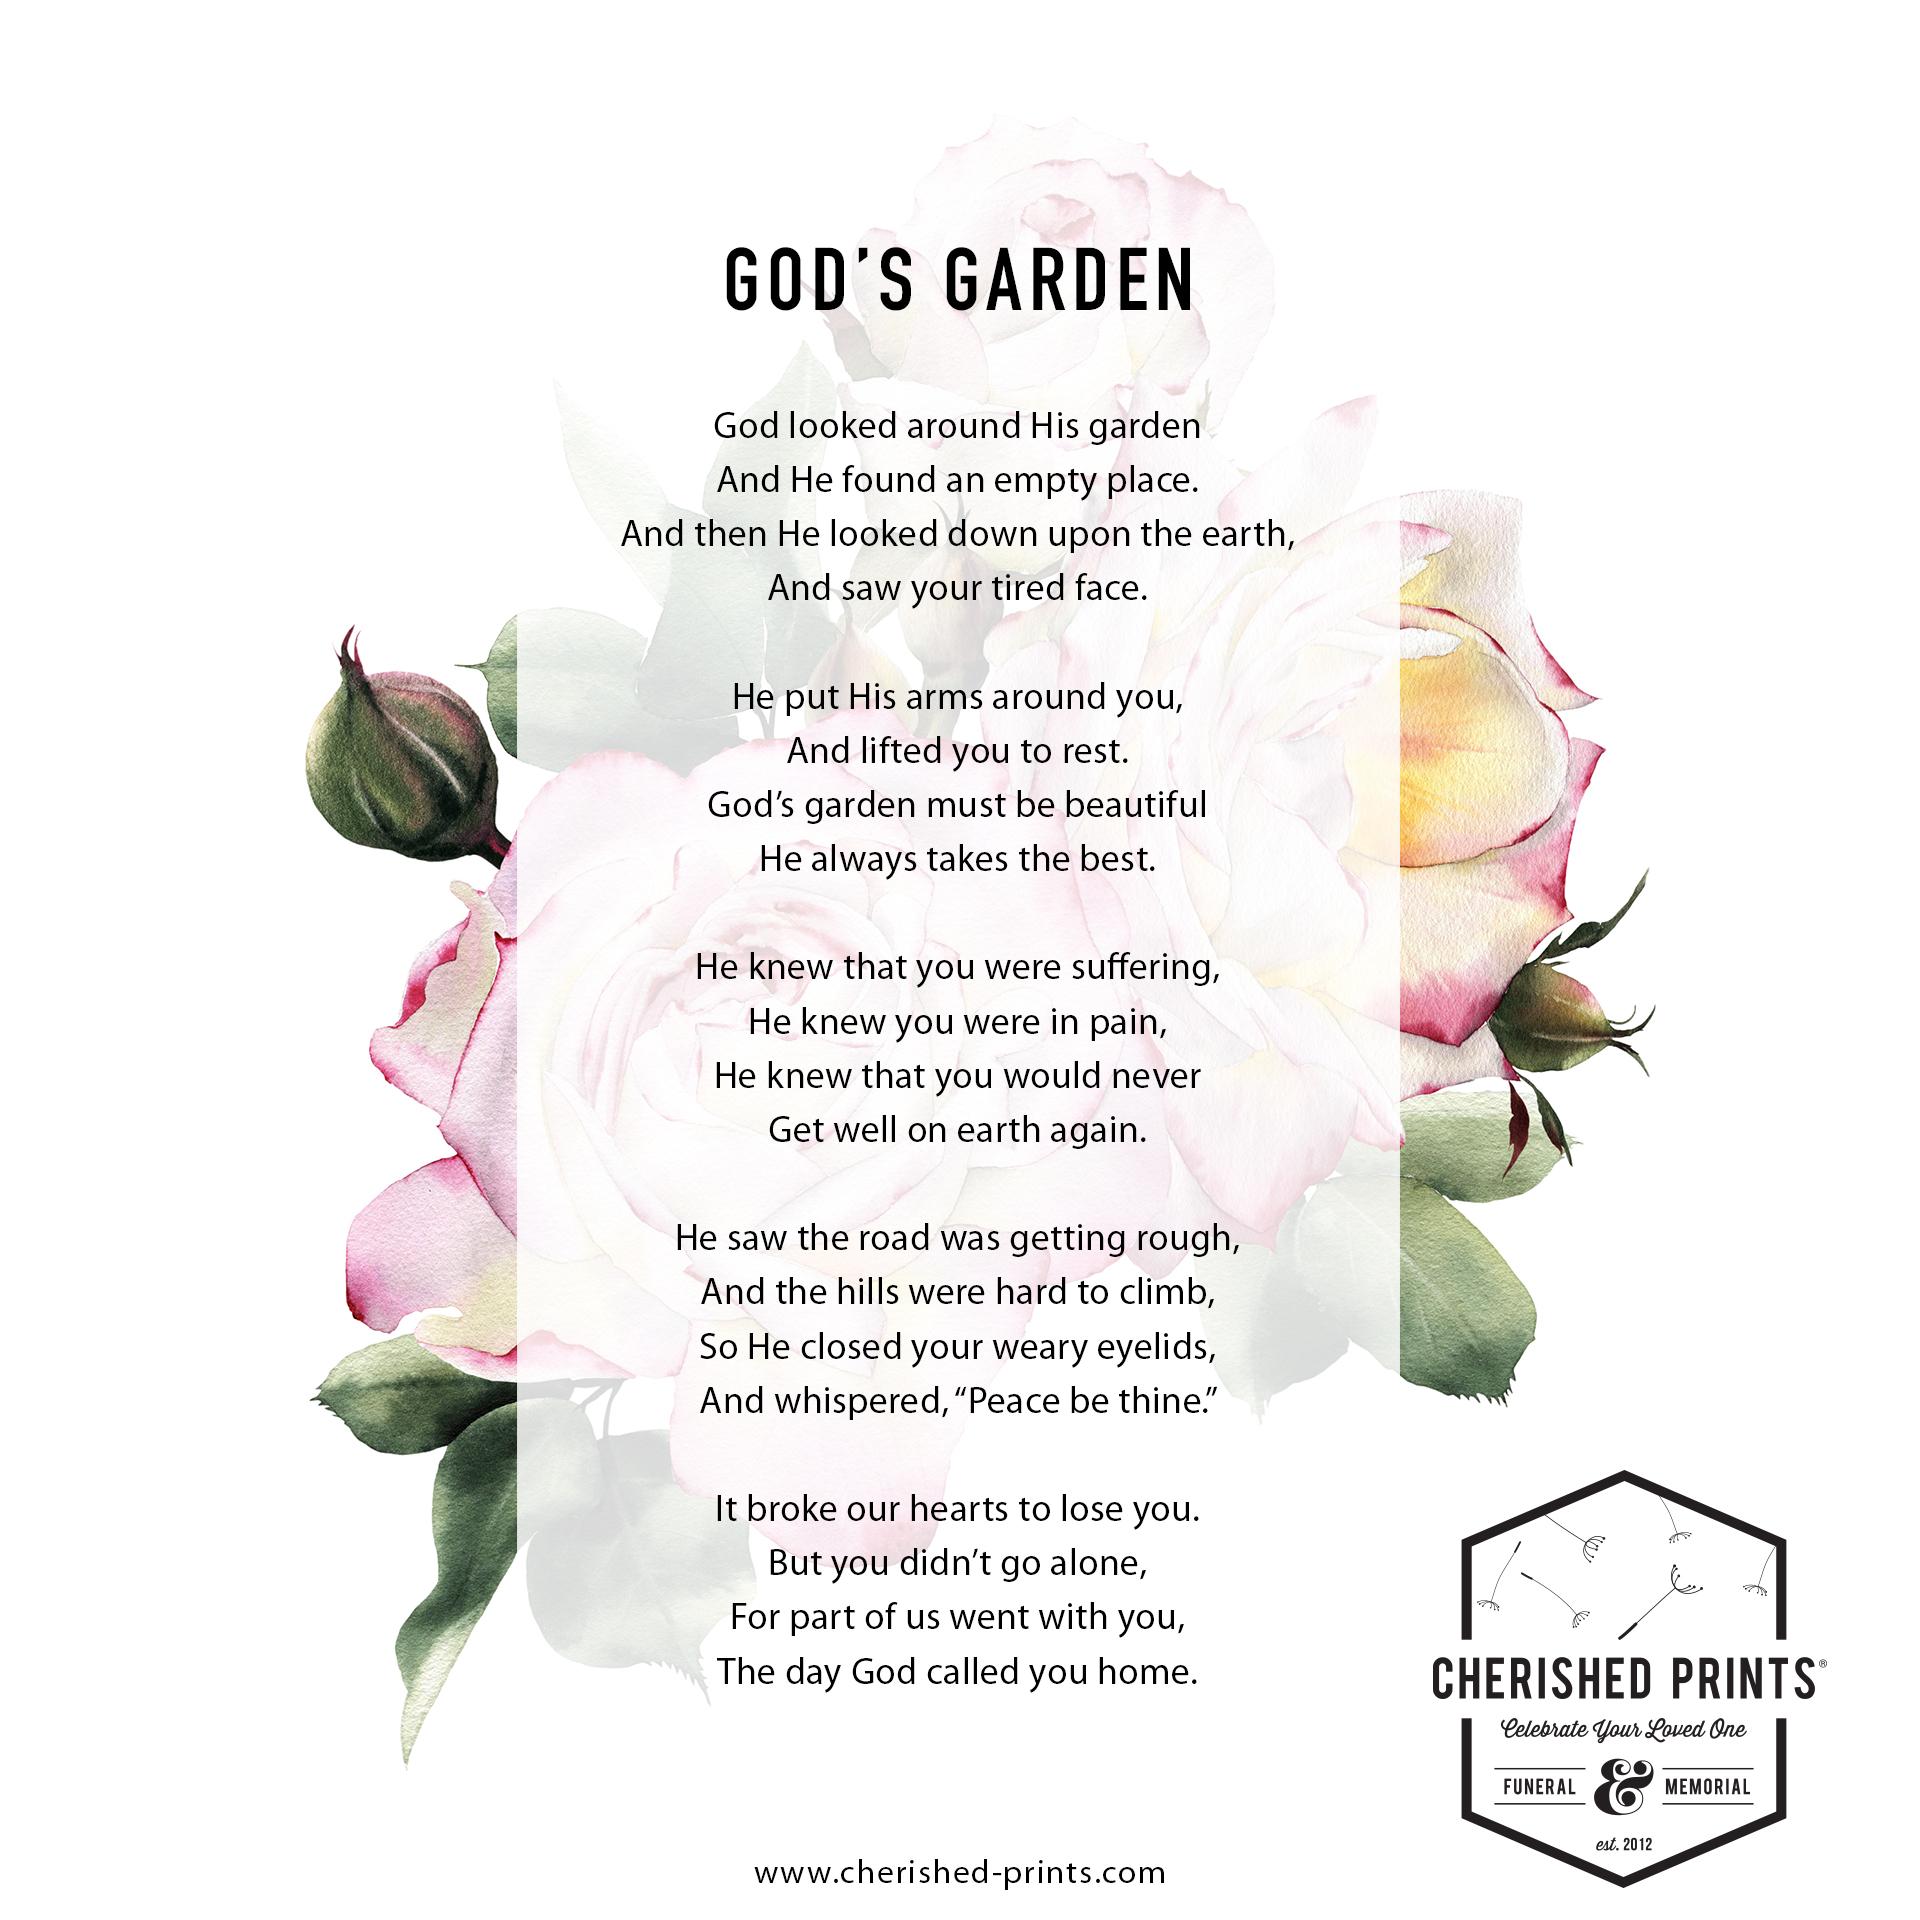 God's Garden-Cherished Prints-Library